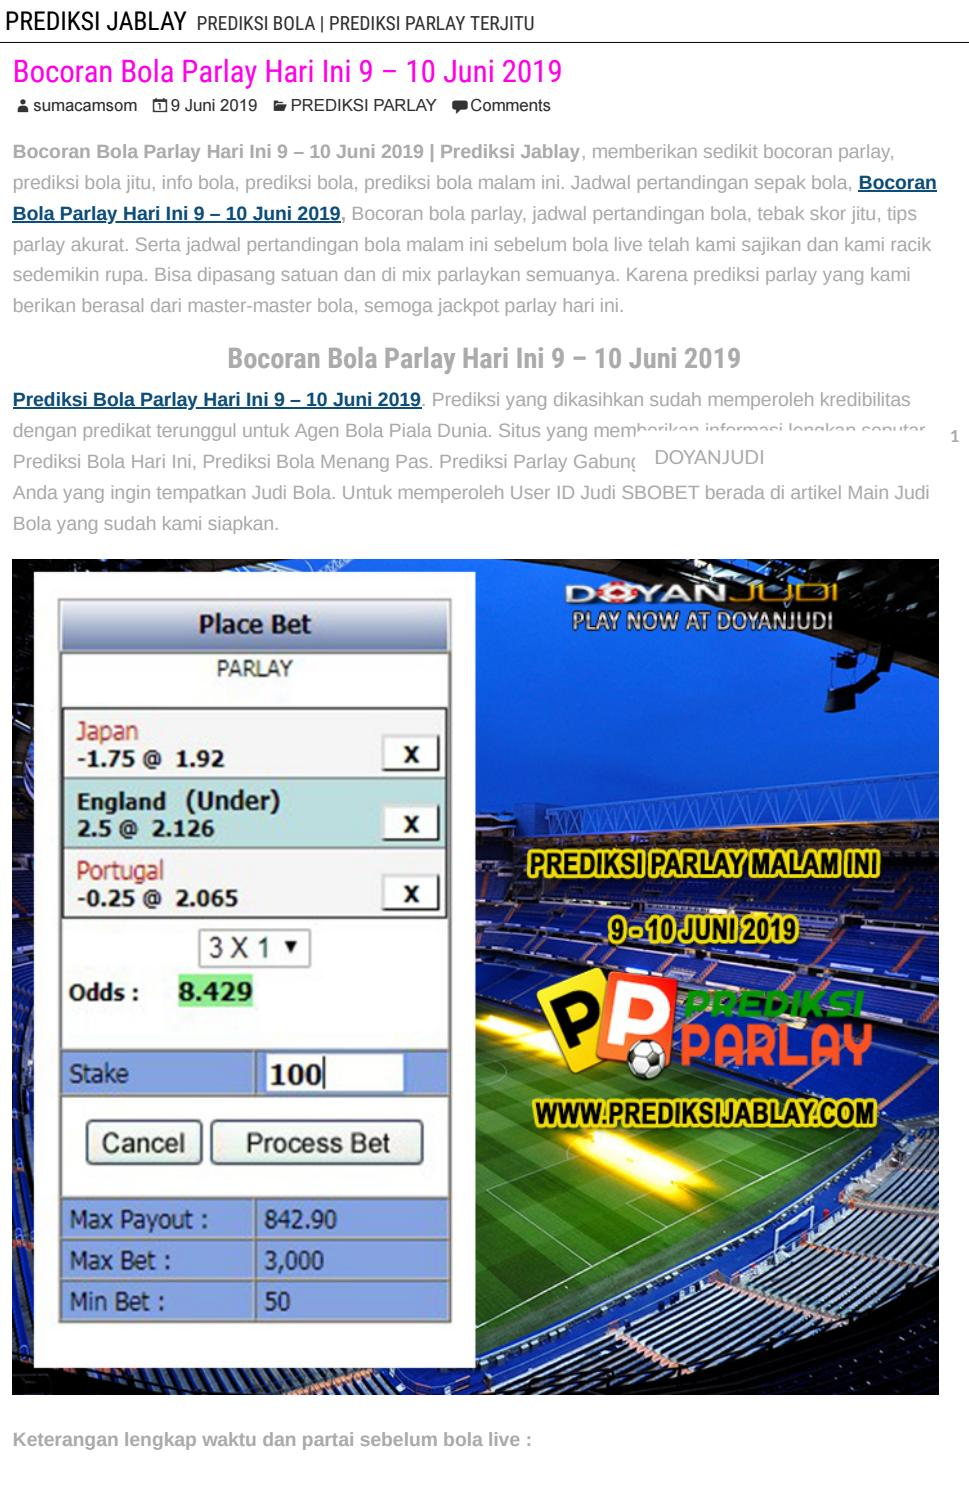 Bocoran Bola Parlay Hari Ini 9 10 Juni 2019 Prediksi Jablay By Prediksi Jablay Issuu